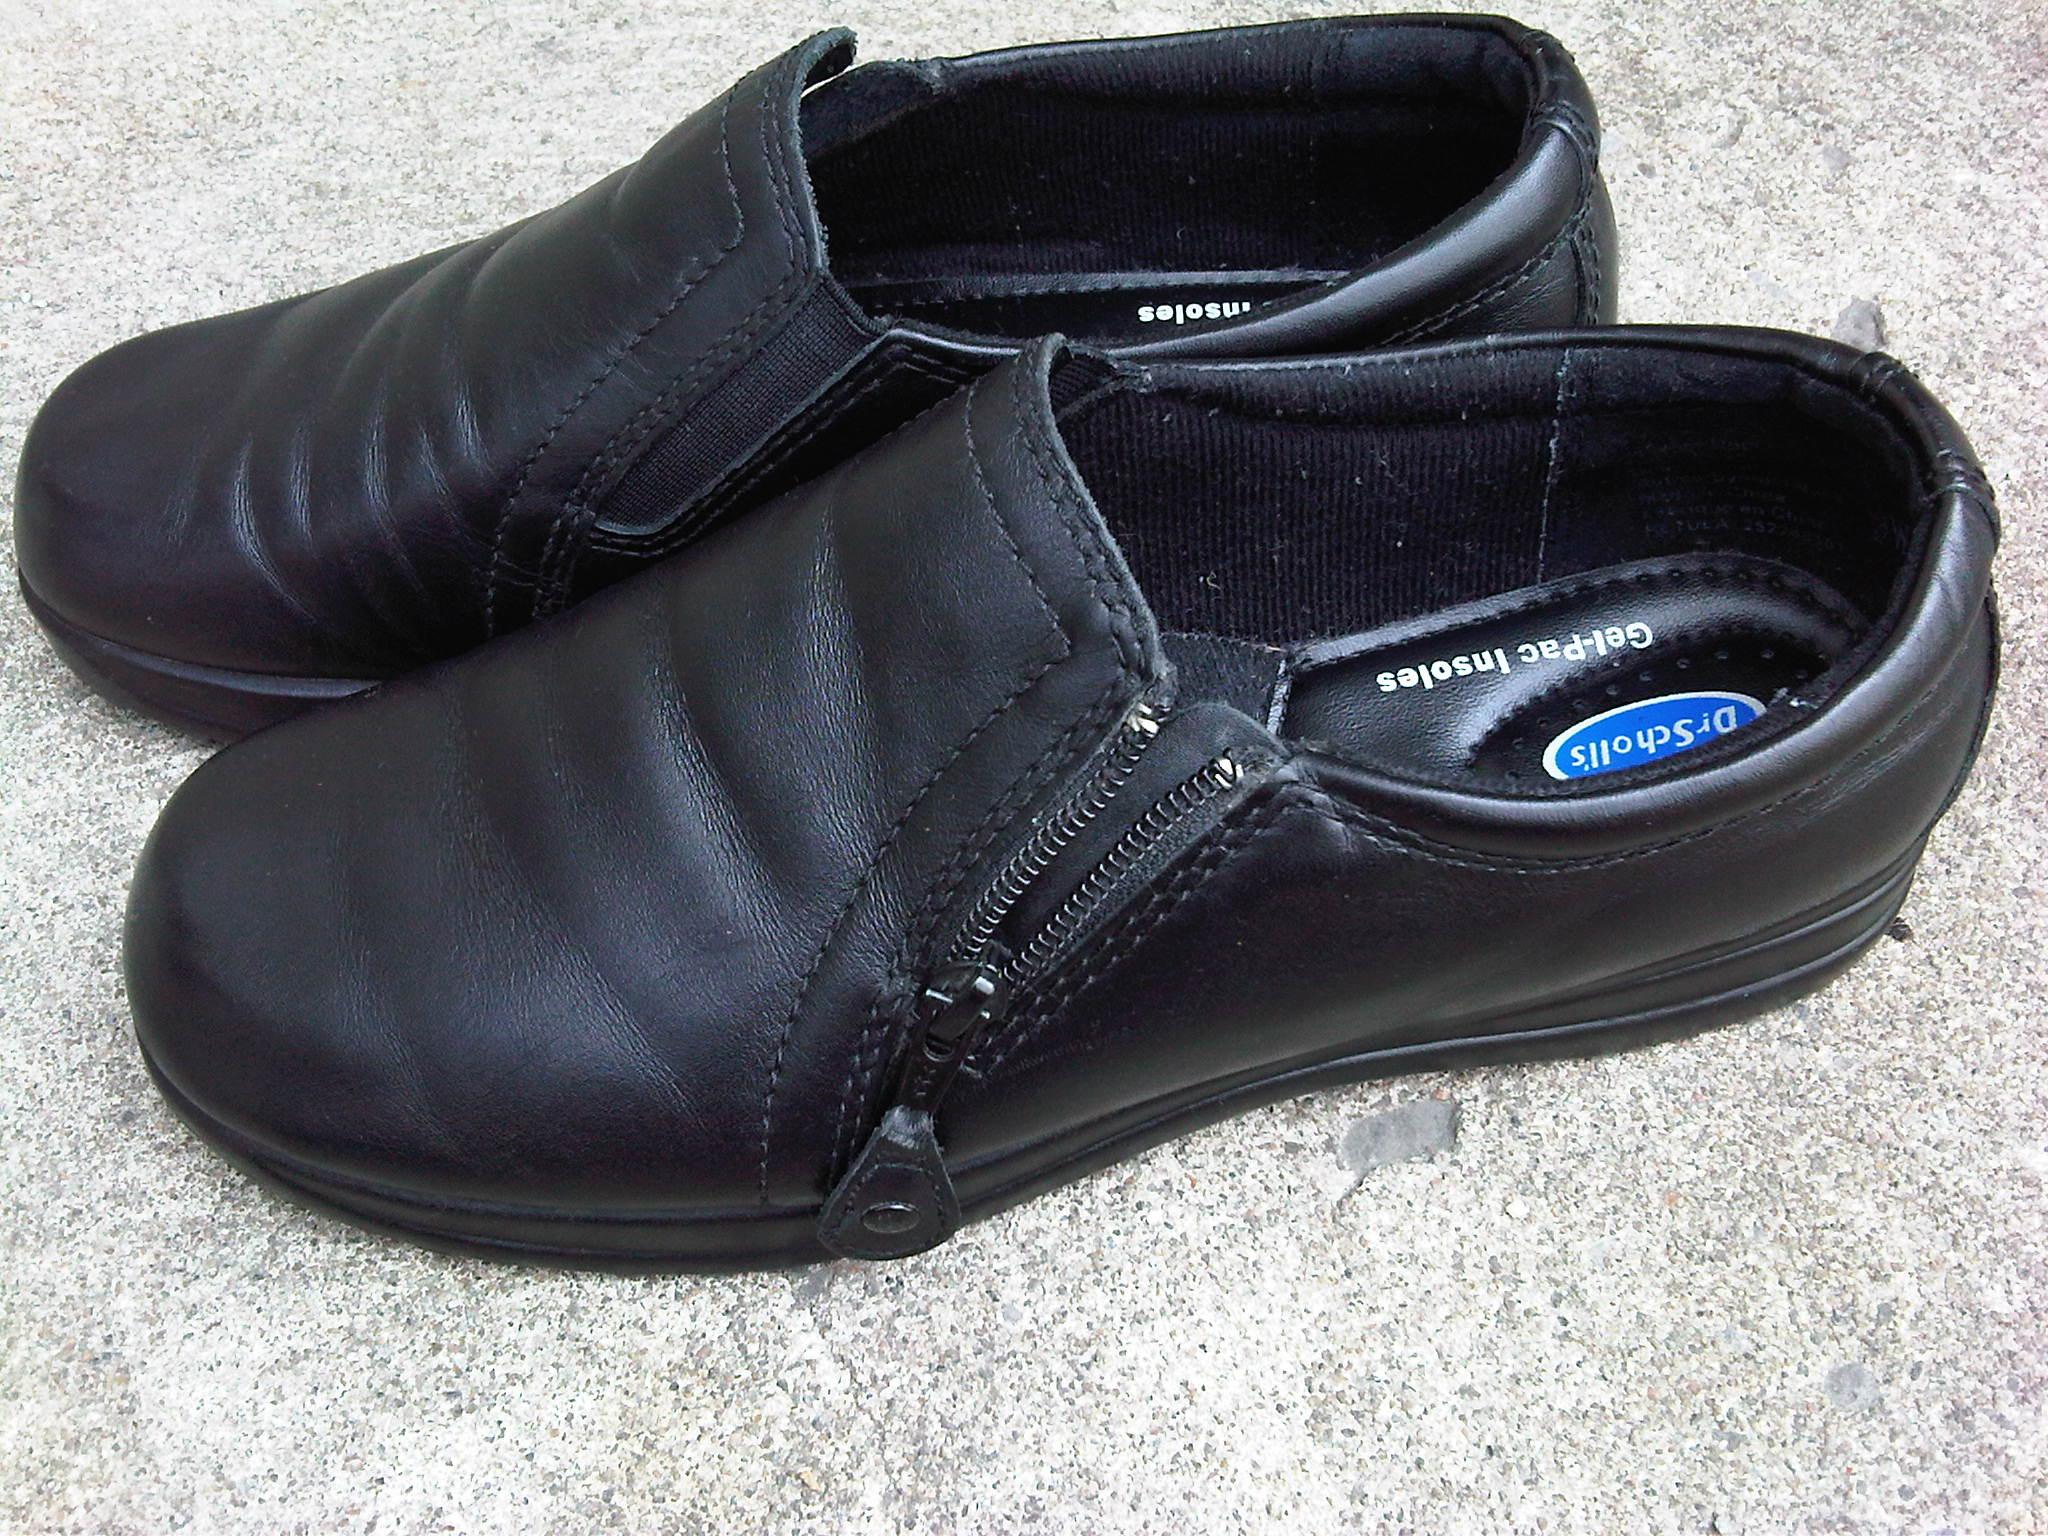 bba633b8642 Dr. Scholl s – Women s Marci Gel-Pac Zippered Loafers